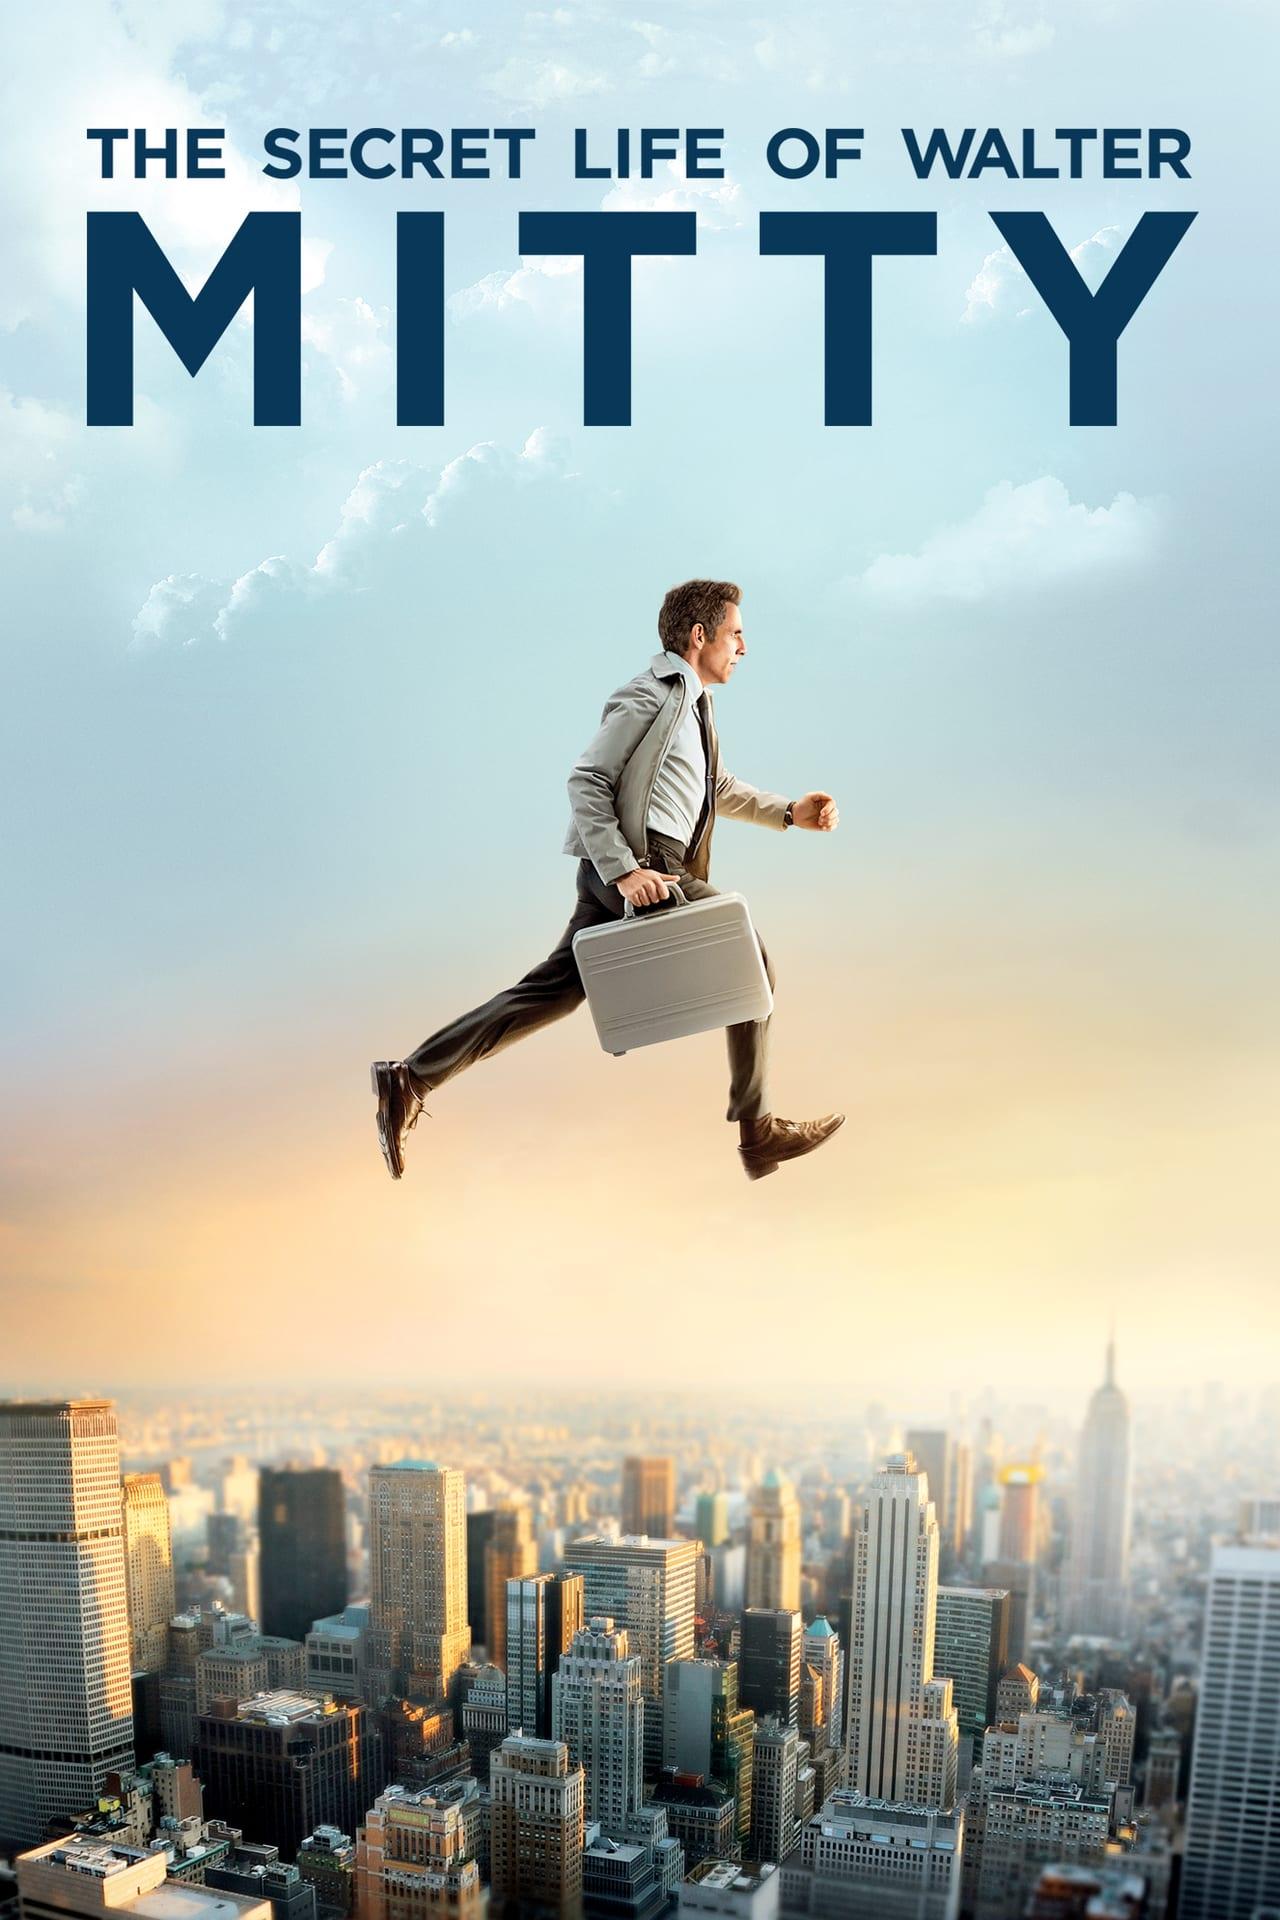 The Secret Life of Walter Mitty by Ben Stiller